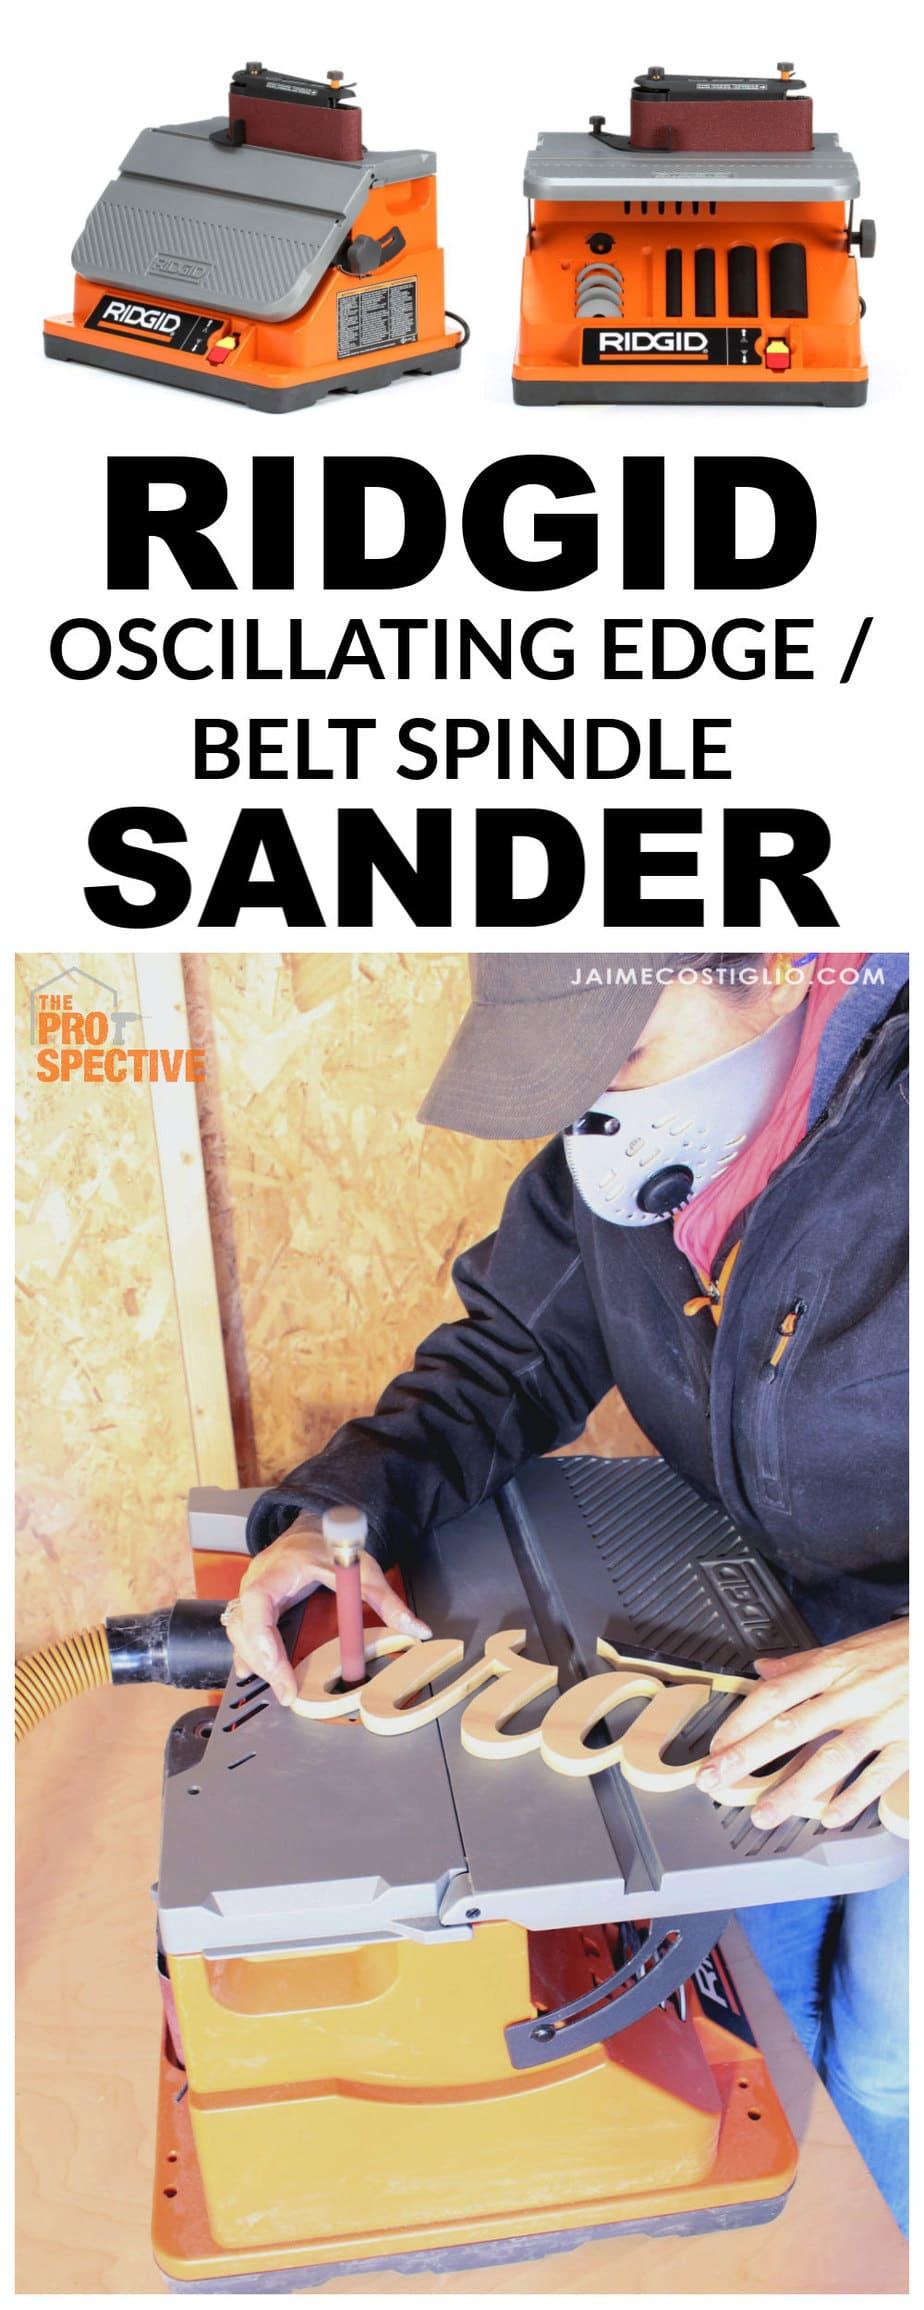 ridgid belt sander